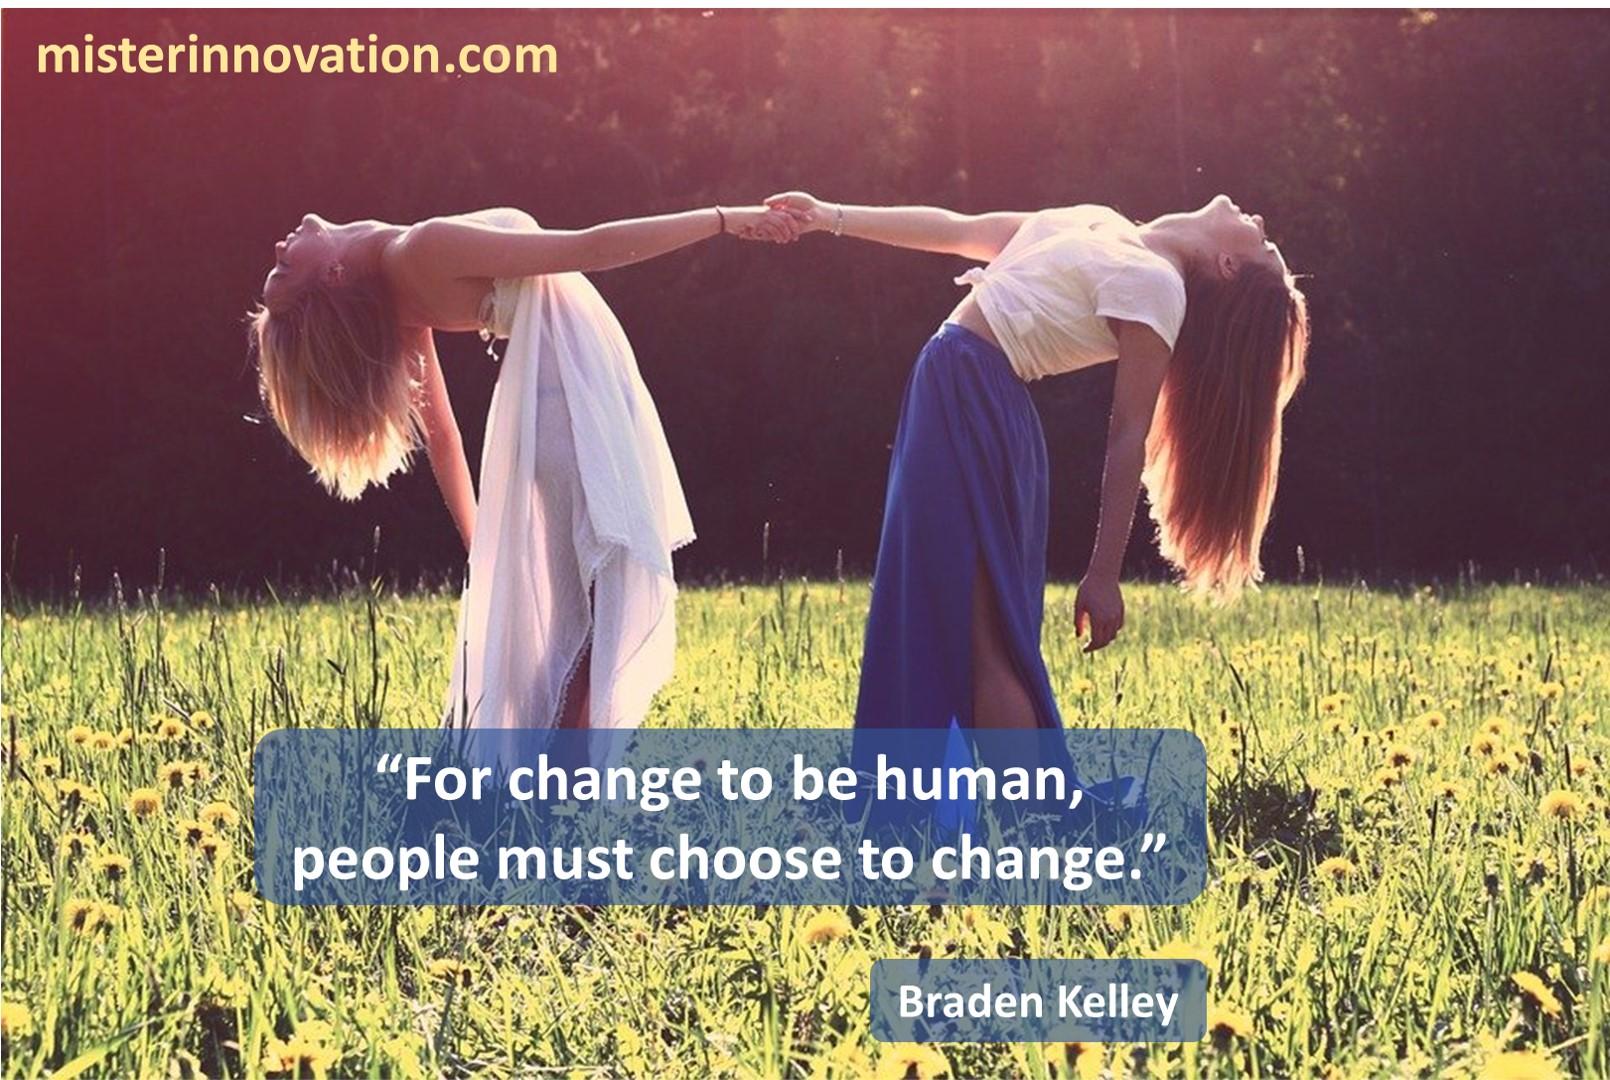 Change to be Human